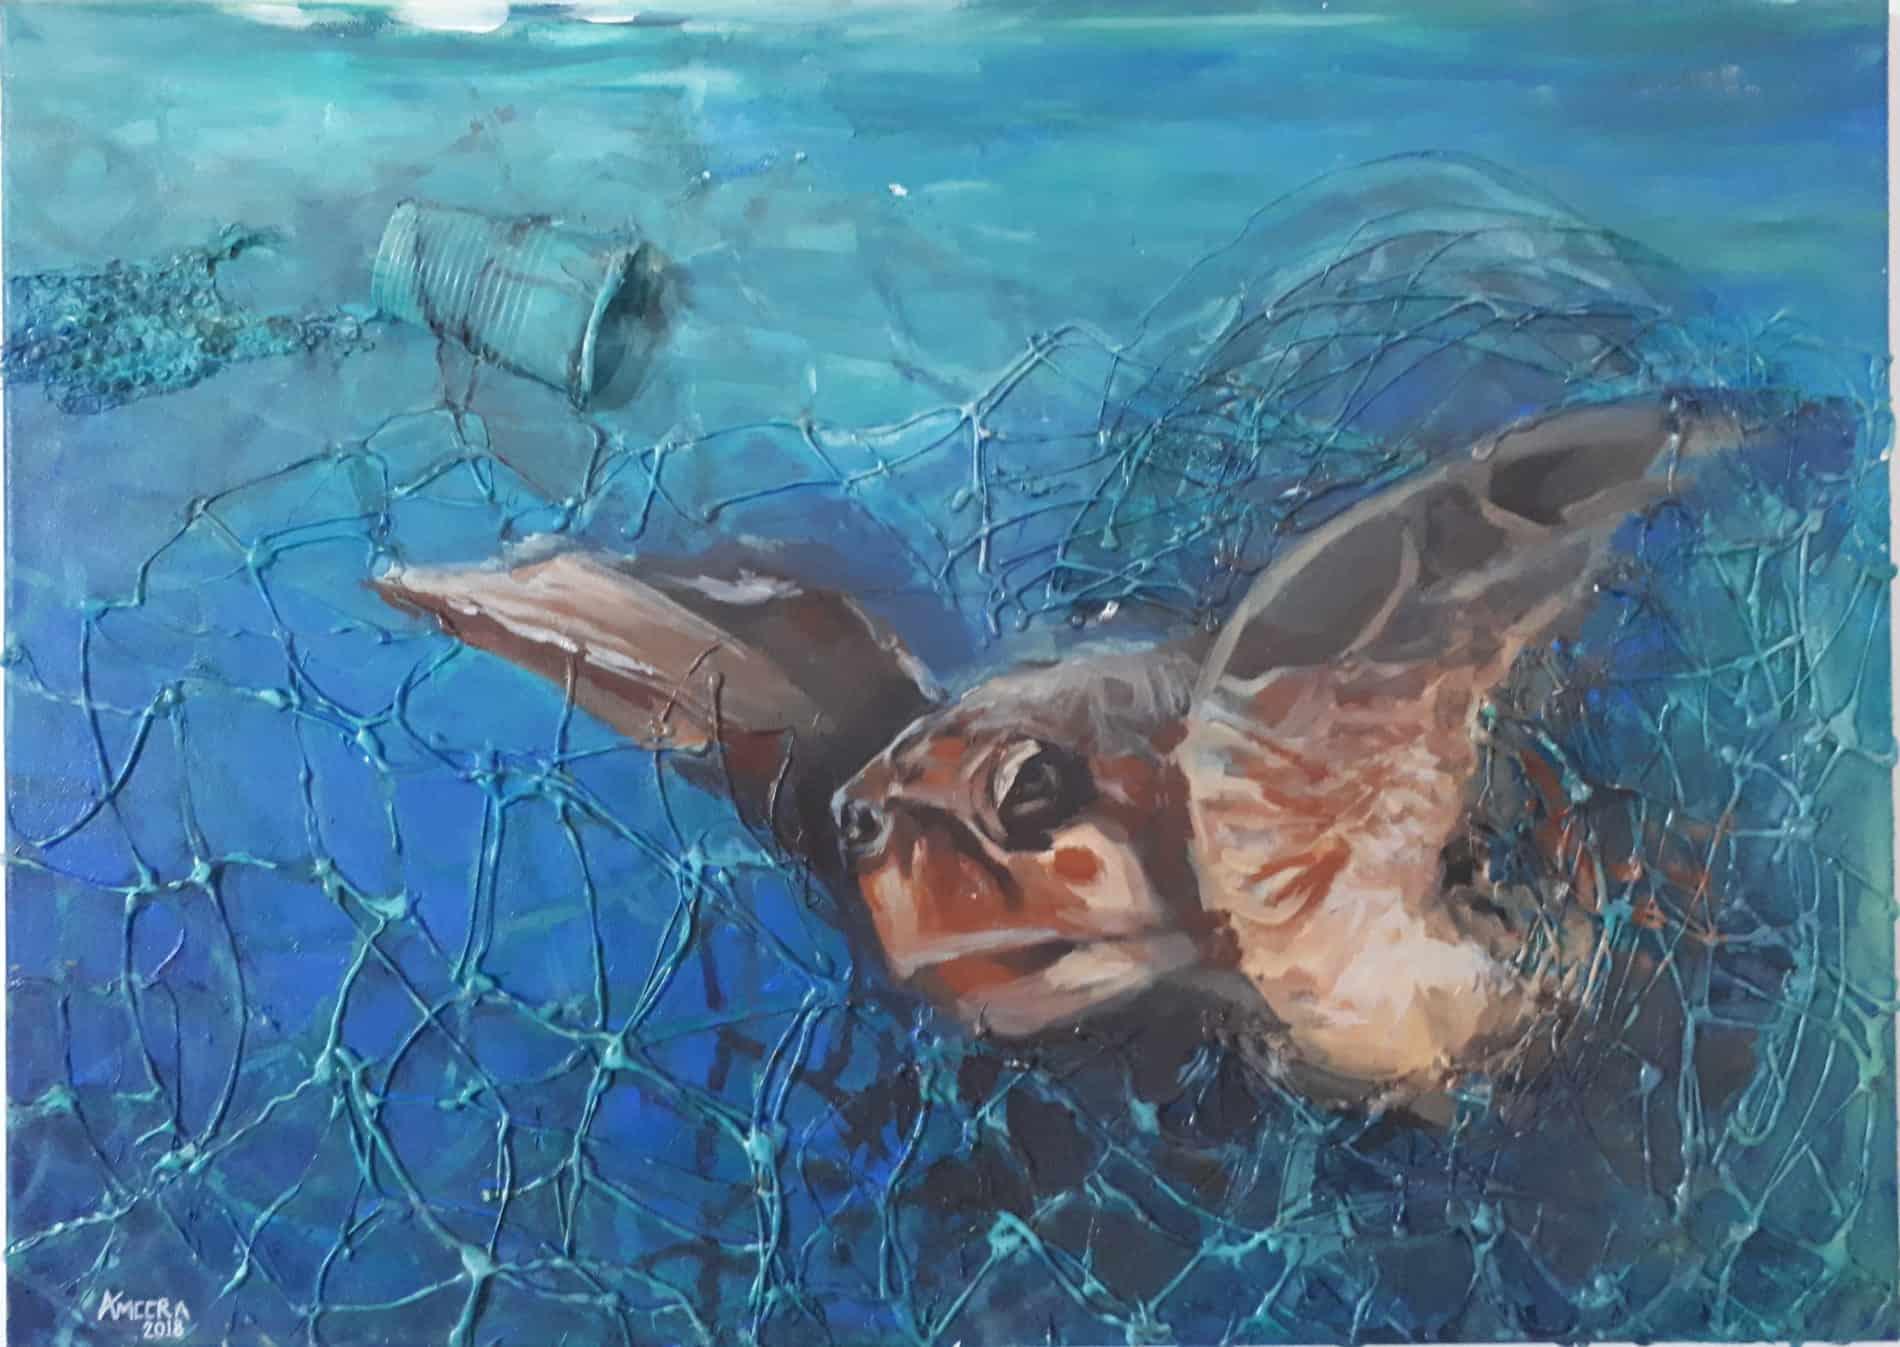 mauritius-arts-ameera-koheeallee-trapped